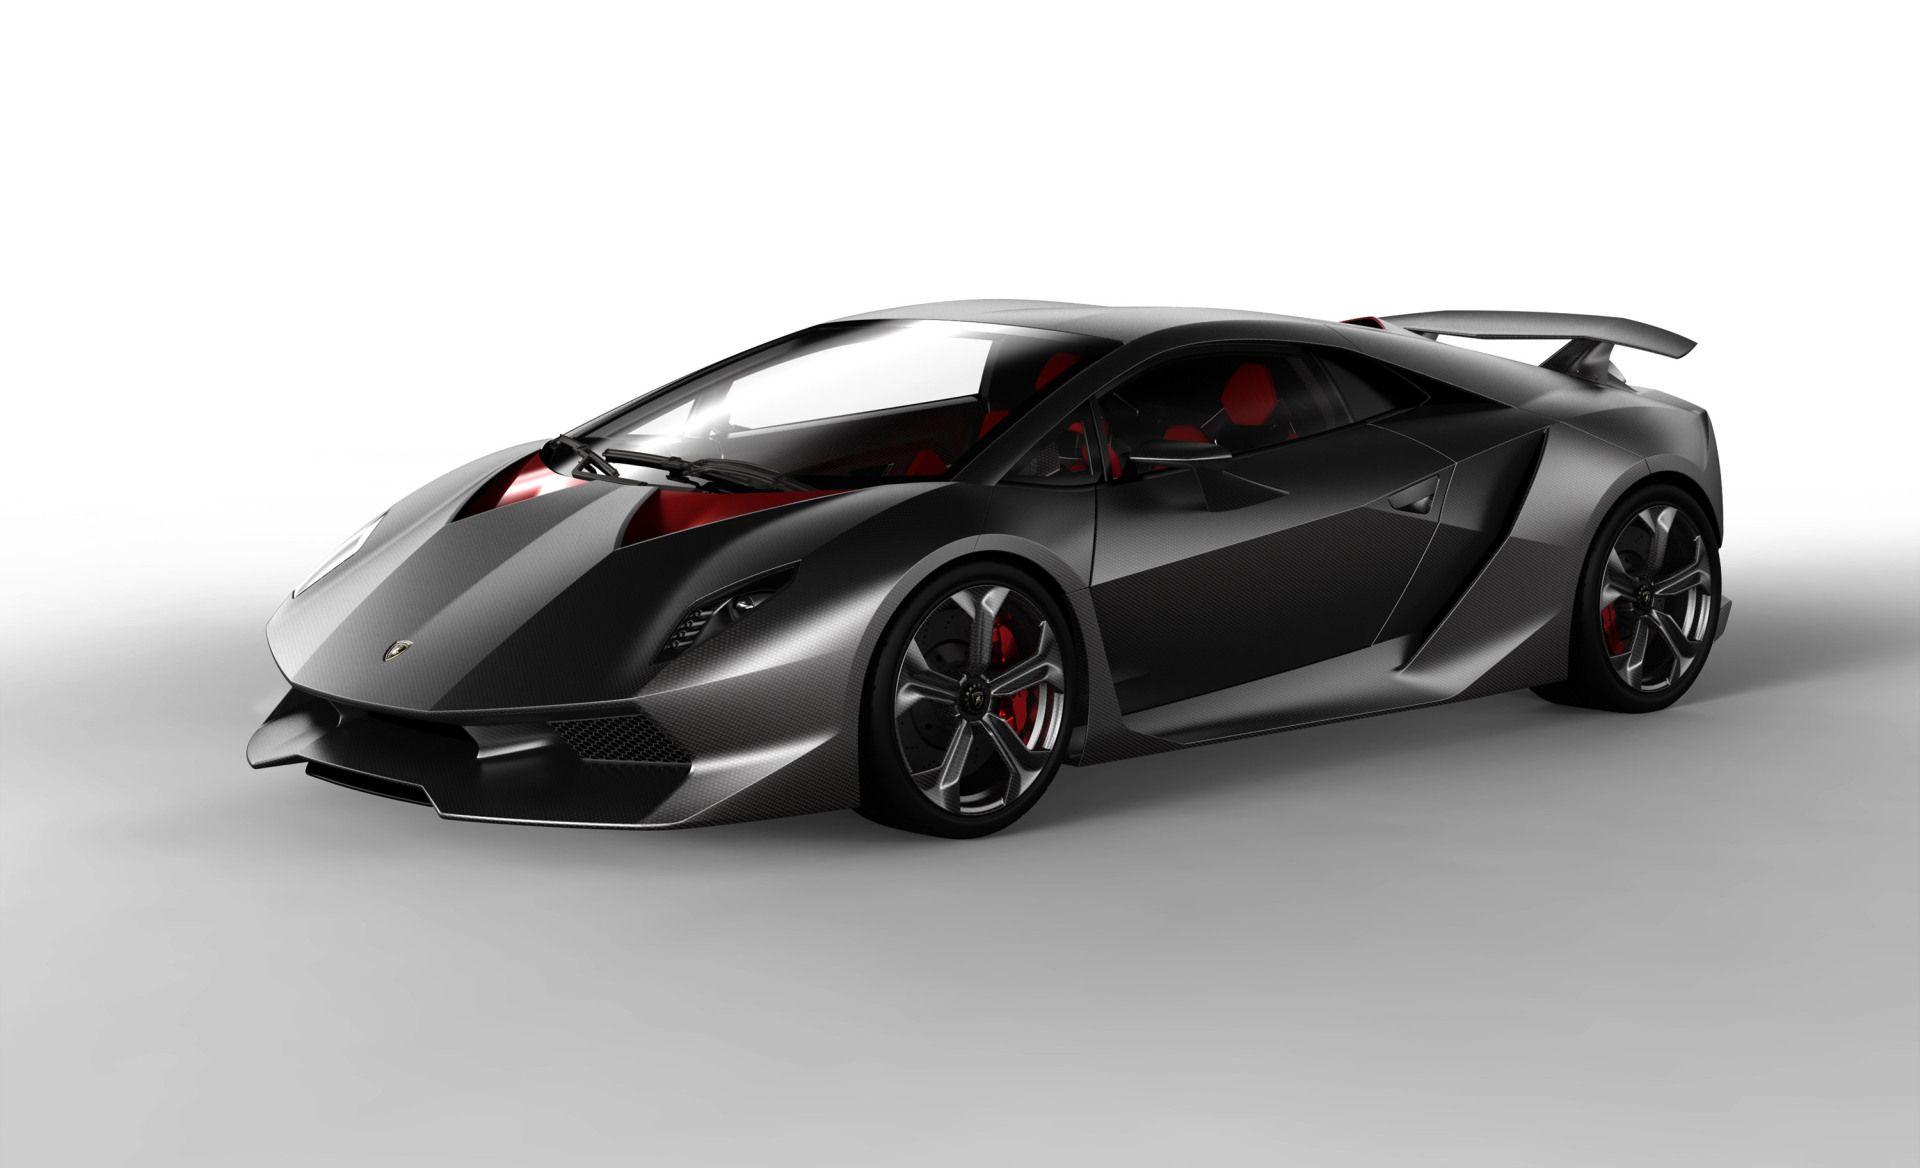 The Most Expensive Supercars Of Lamborghini Supercars - 8 expensive supercars 2014